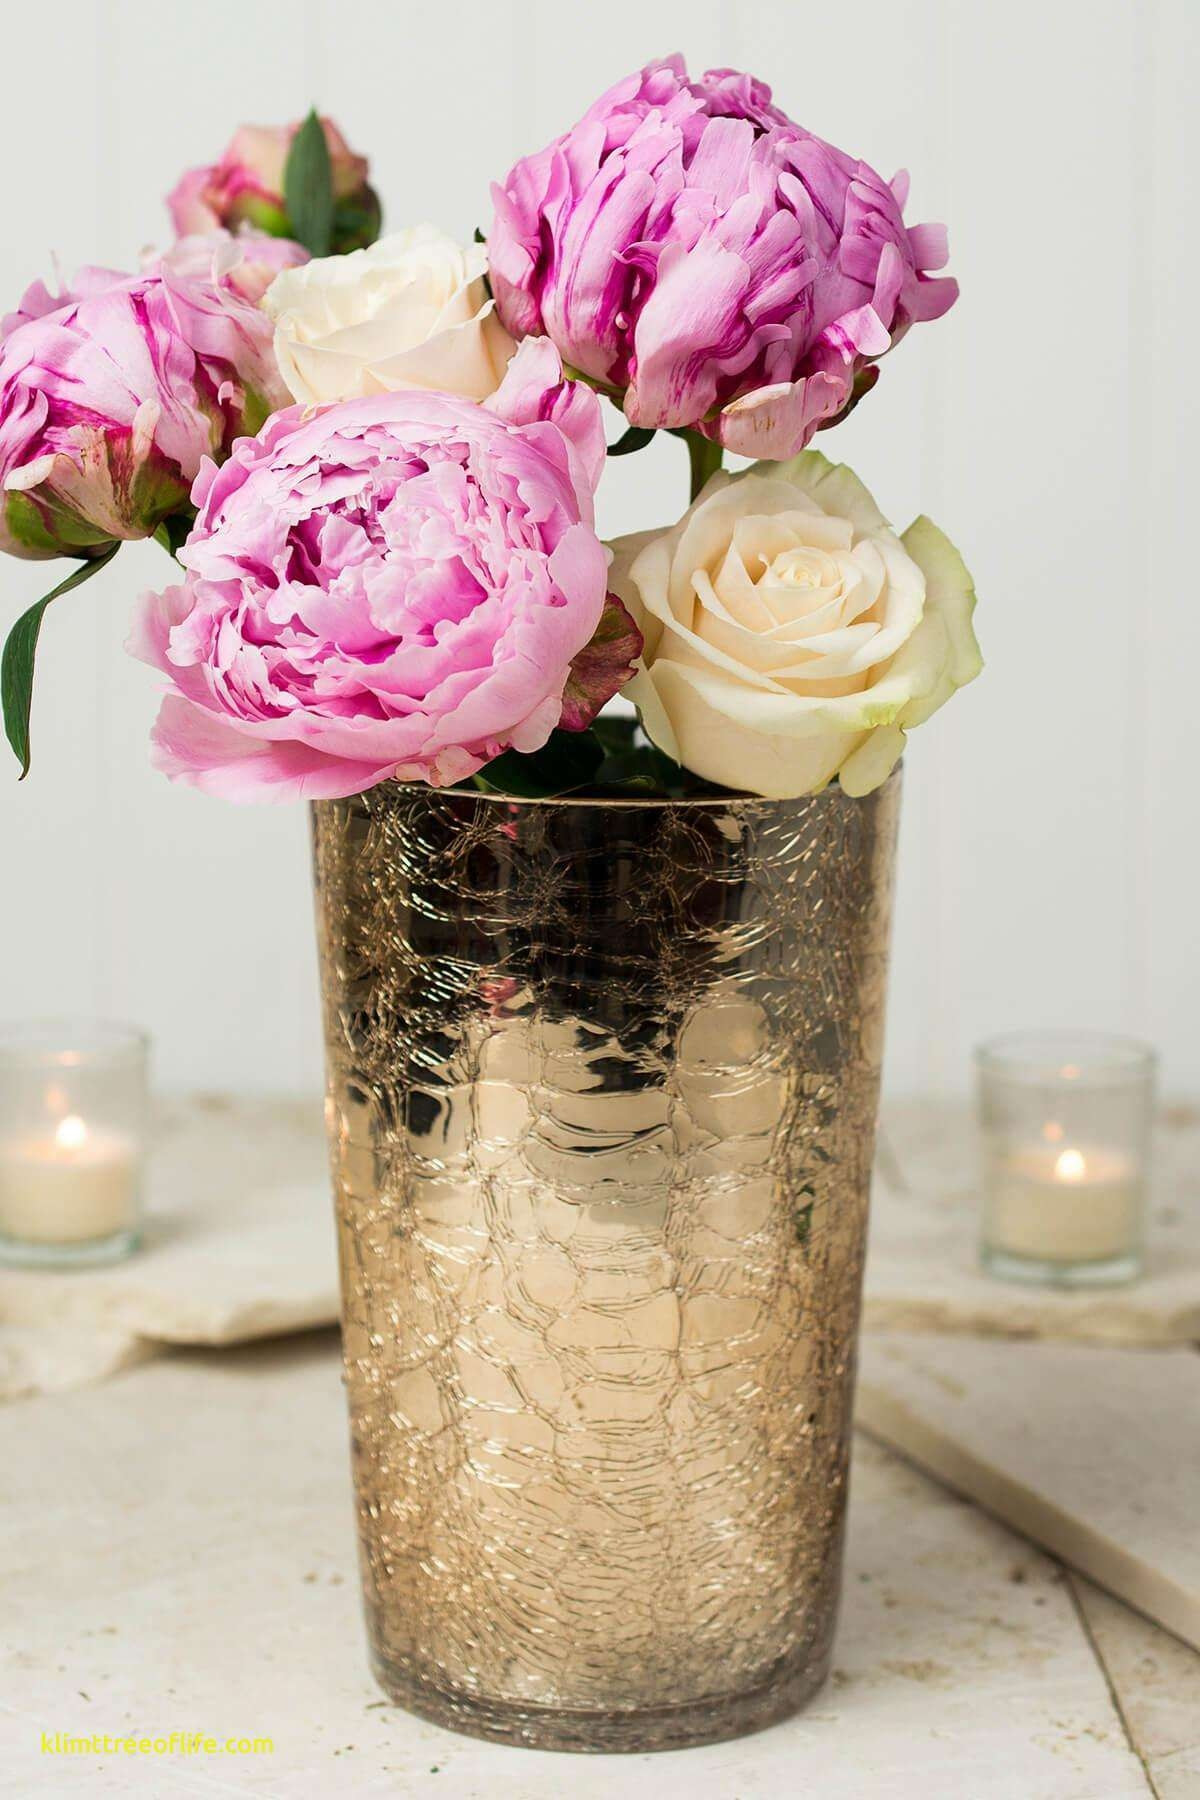 tin flower vase of 23 elegant flower vase using recycled materials flower decoration with regard to flower vase using recycled materials fresh 41 elegant flower arrangement ideas image